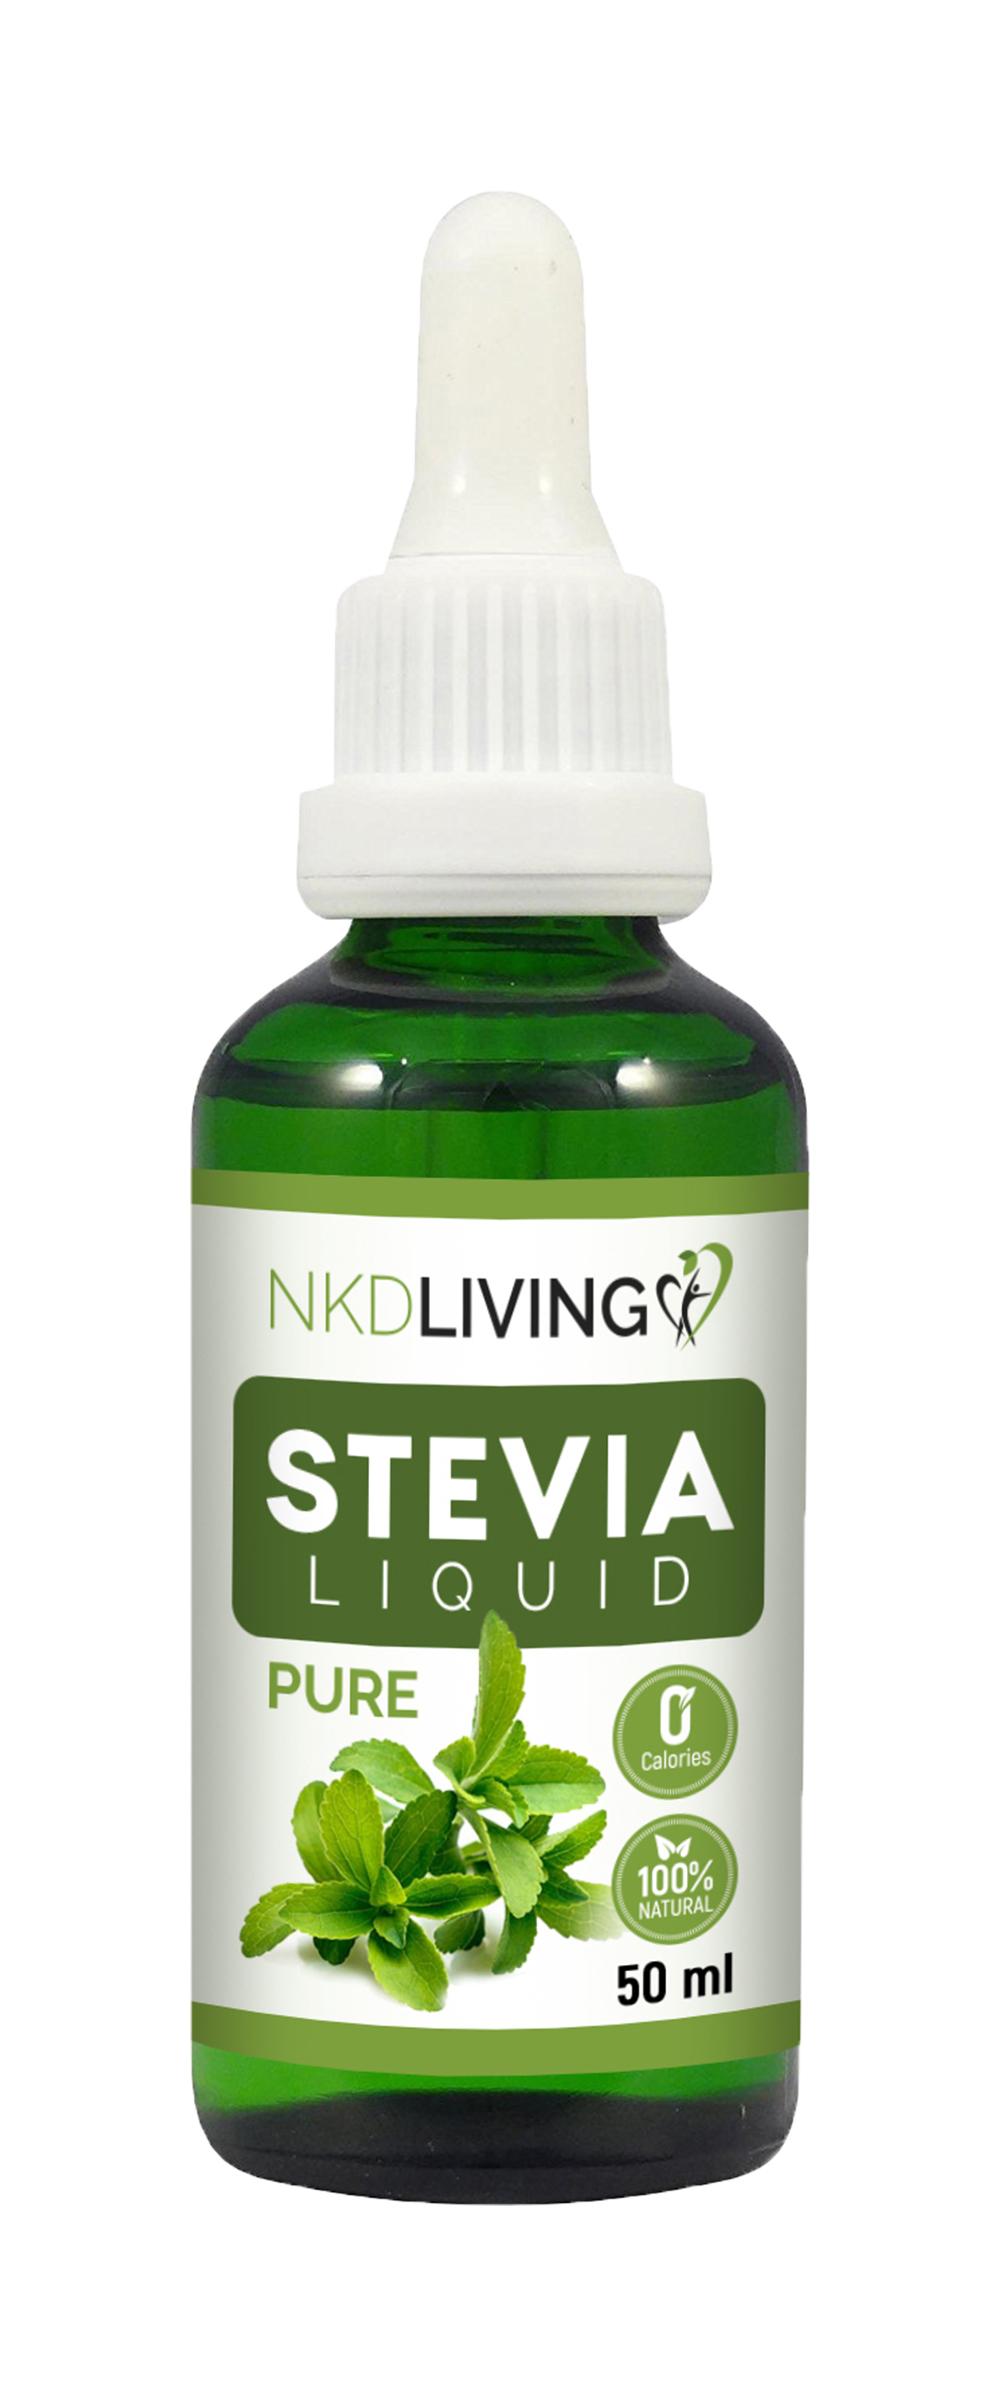 Stevia Liquid Pure 50ml